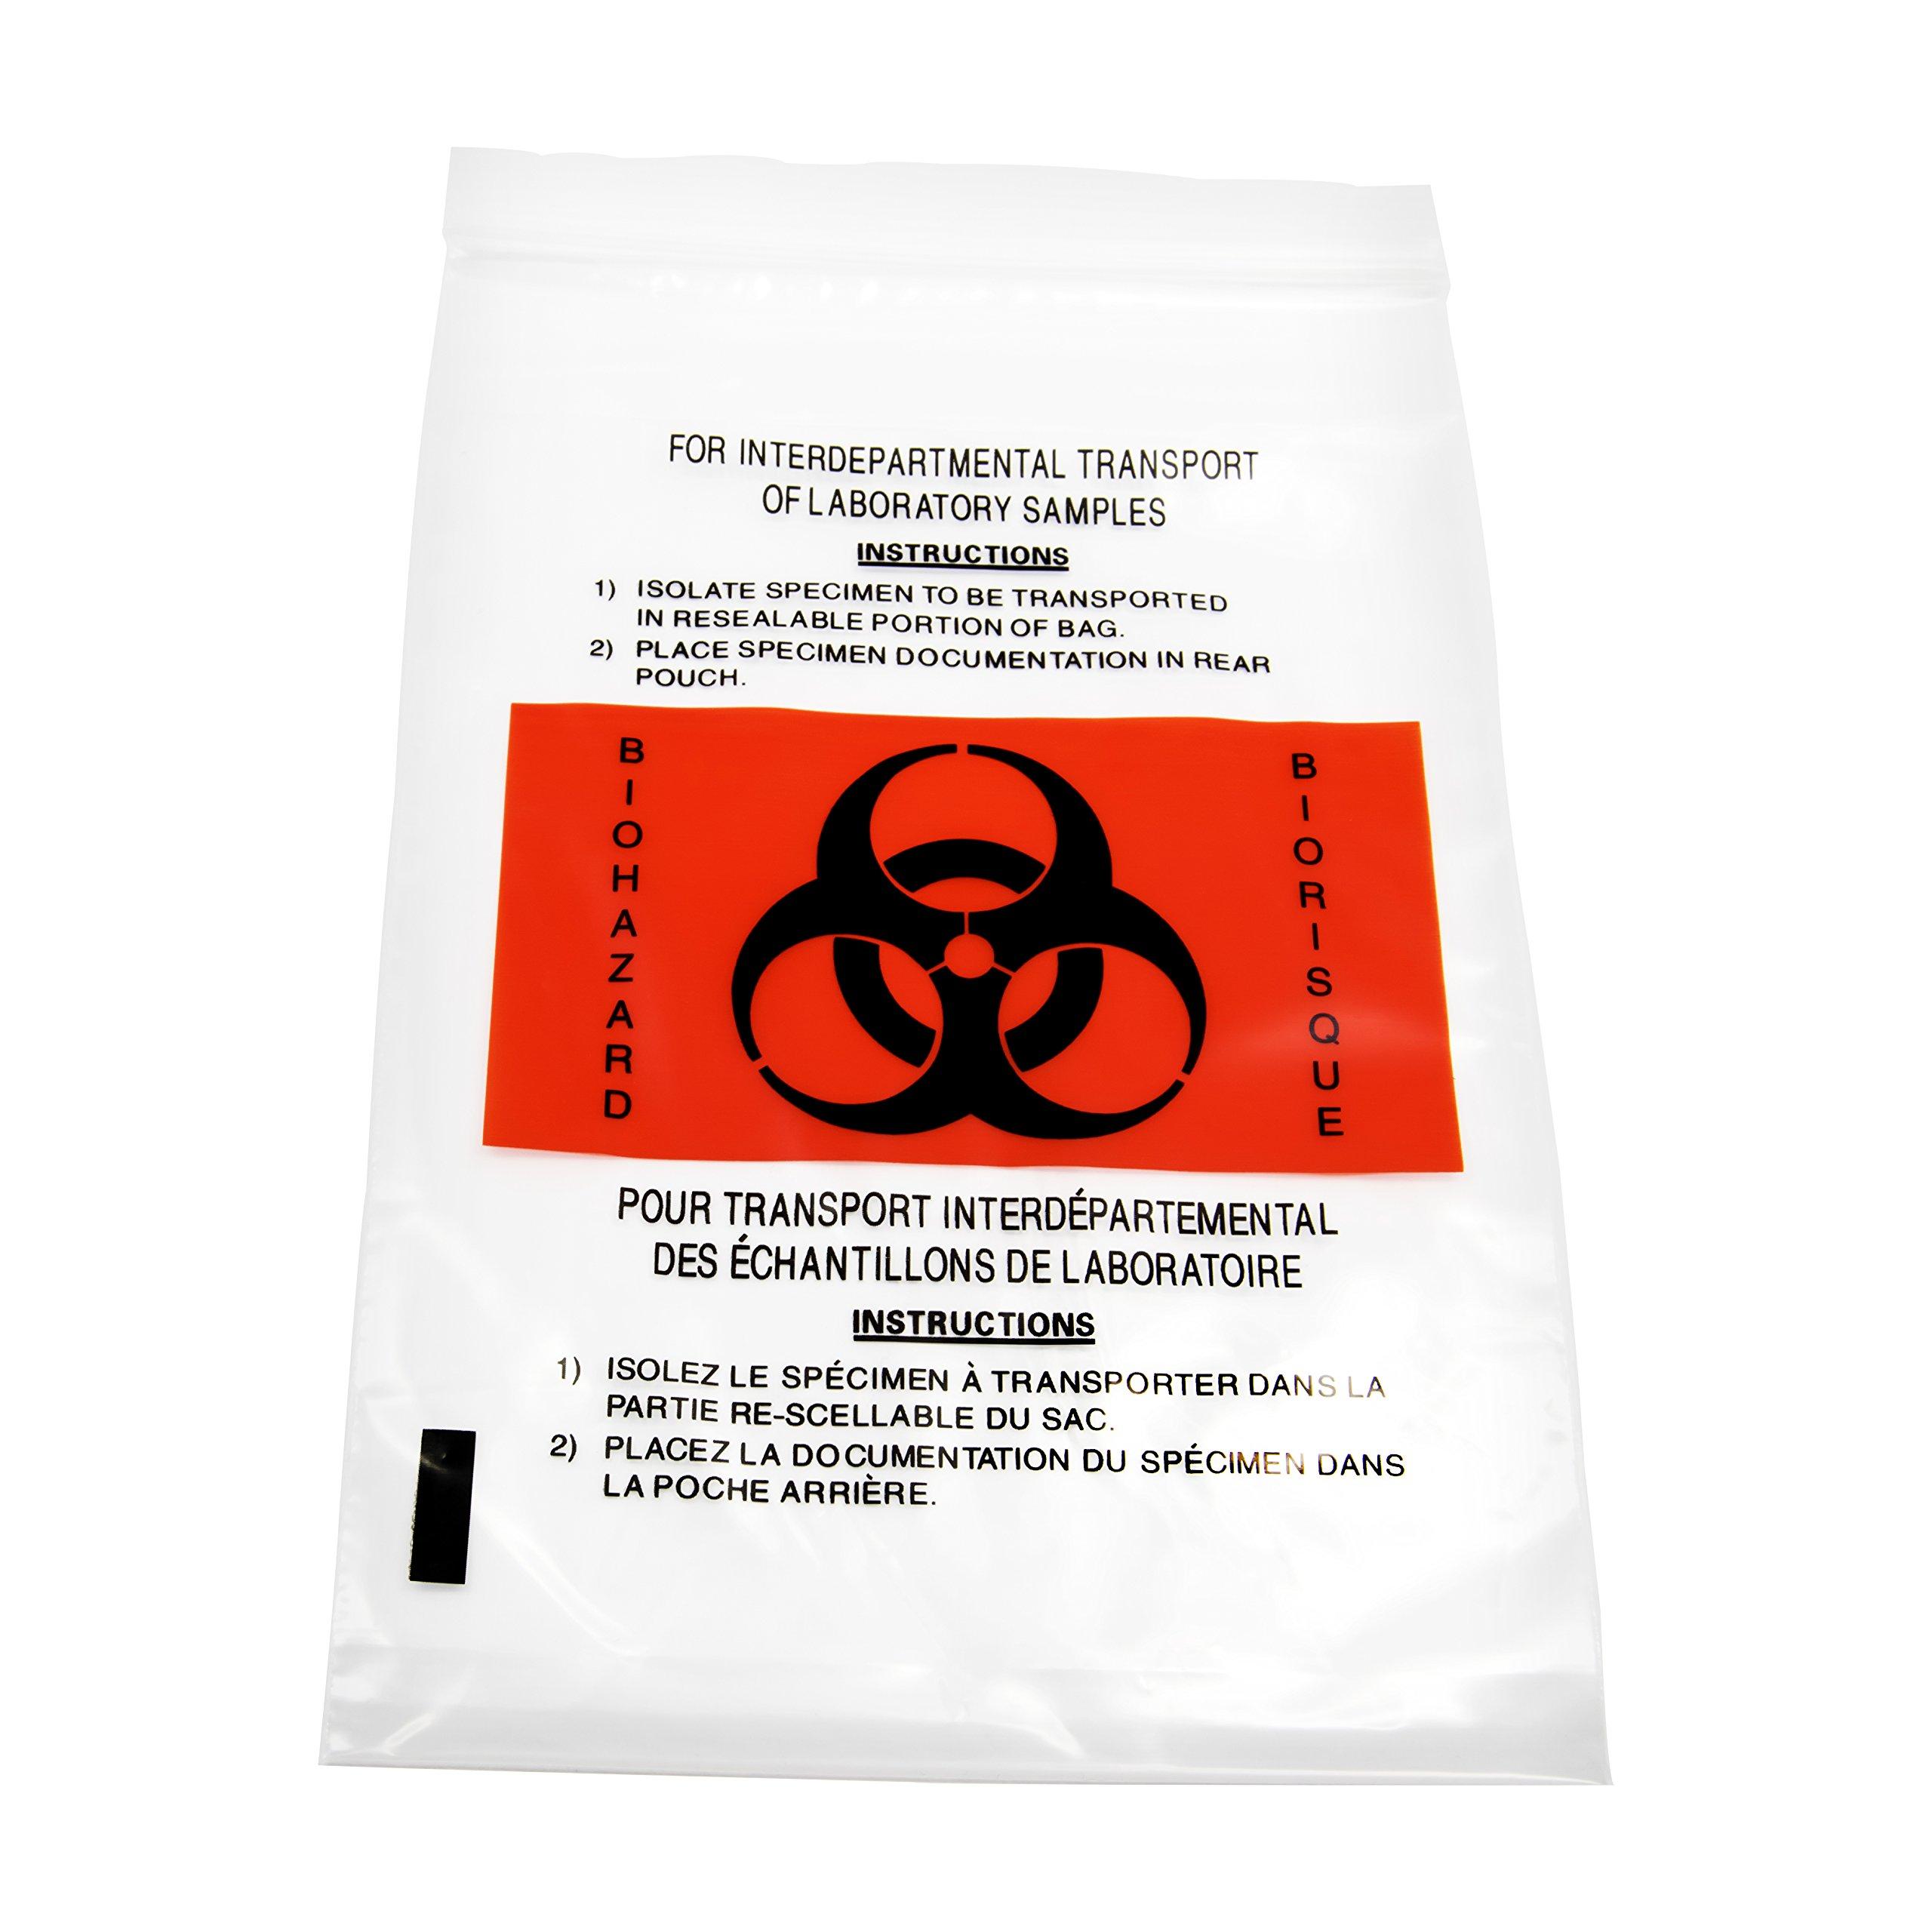 MARATHON MD030196 Hospital Grade Specimen, Biohazard, Lab, Clear Bag With Outside Pocket, Polyethylene - 6 x 9 Inch (500)